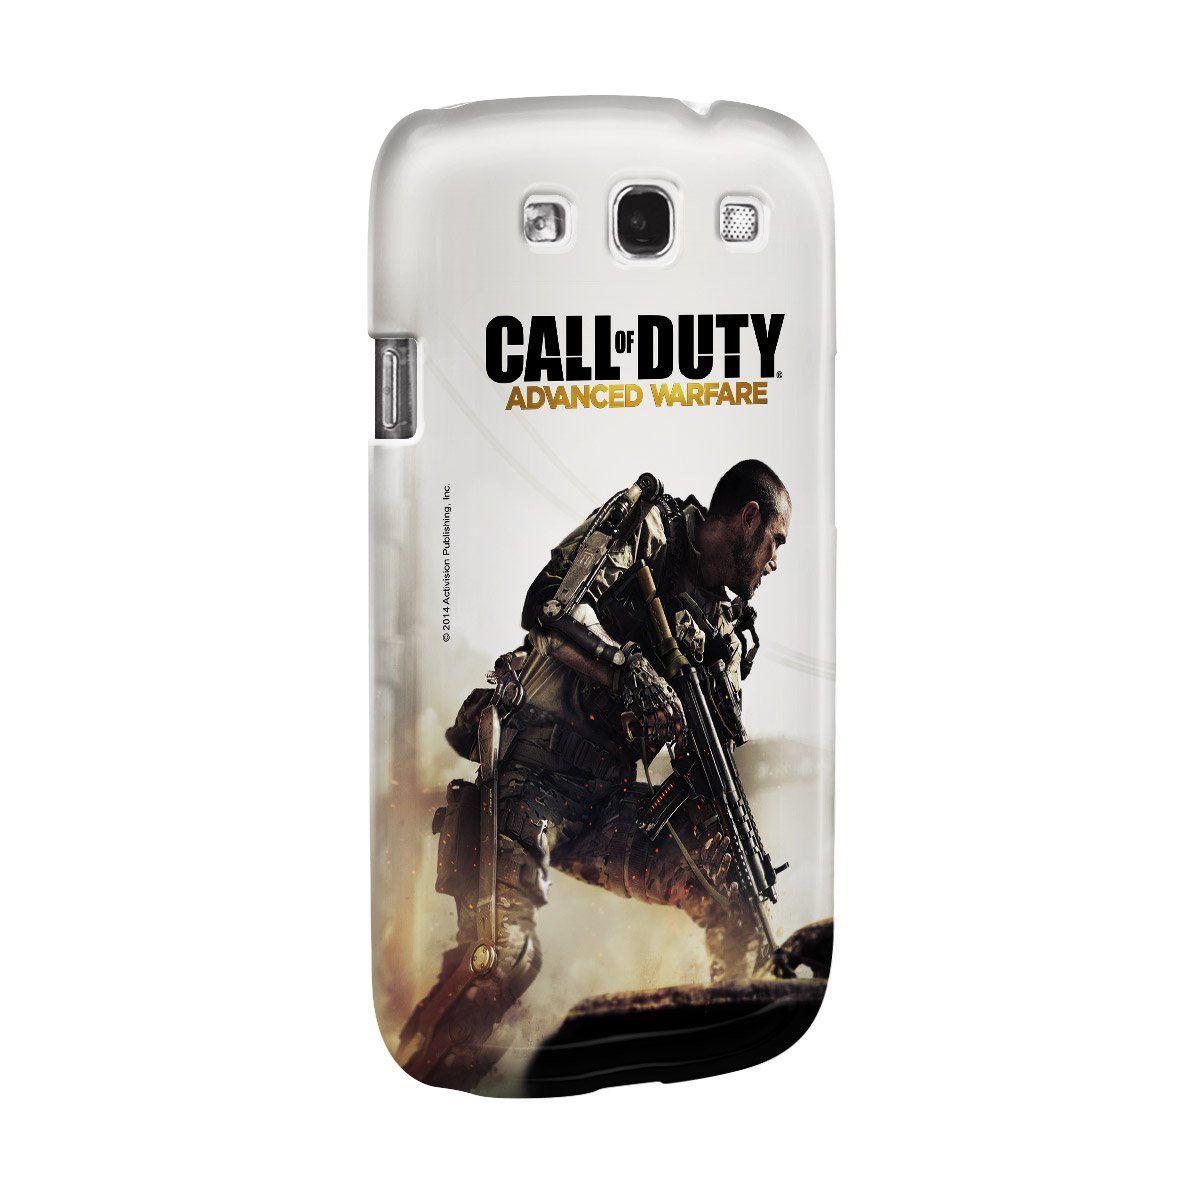 Capa de Celular Samsung Galaxy S3 Call of Duty Soldier  - bandUP Store Marketplace